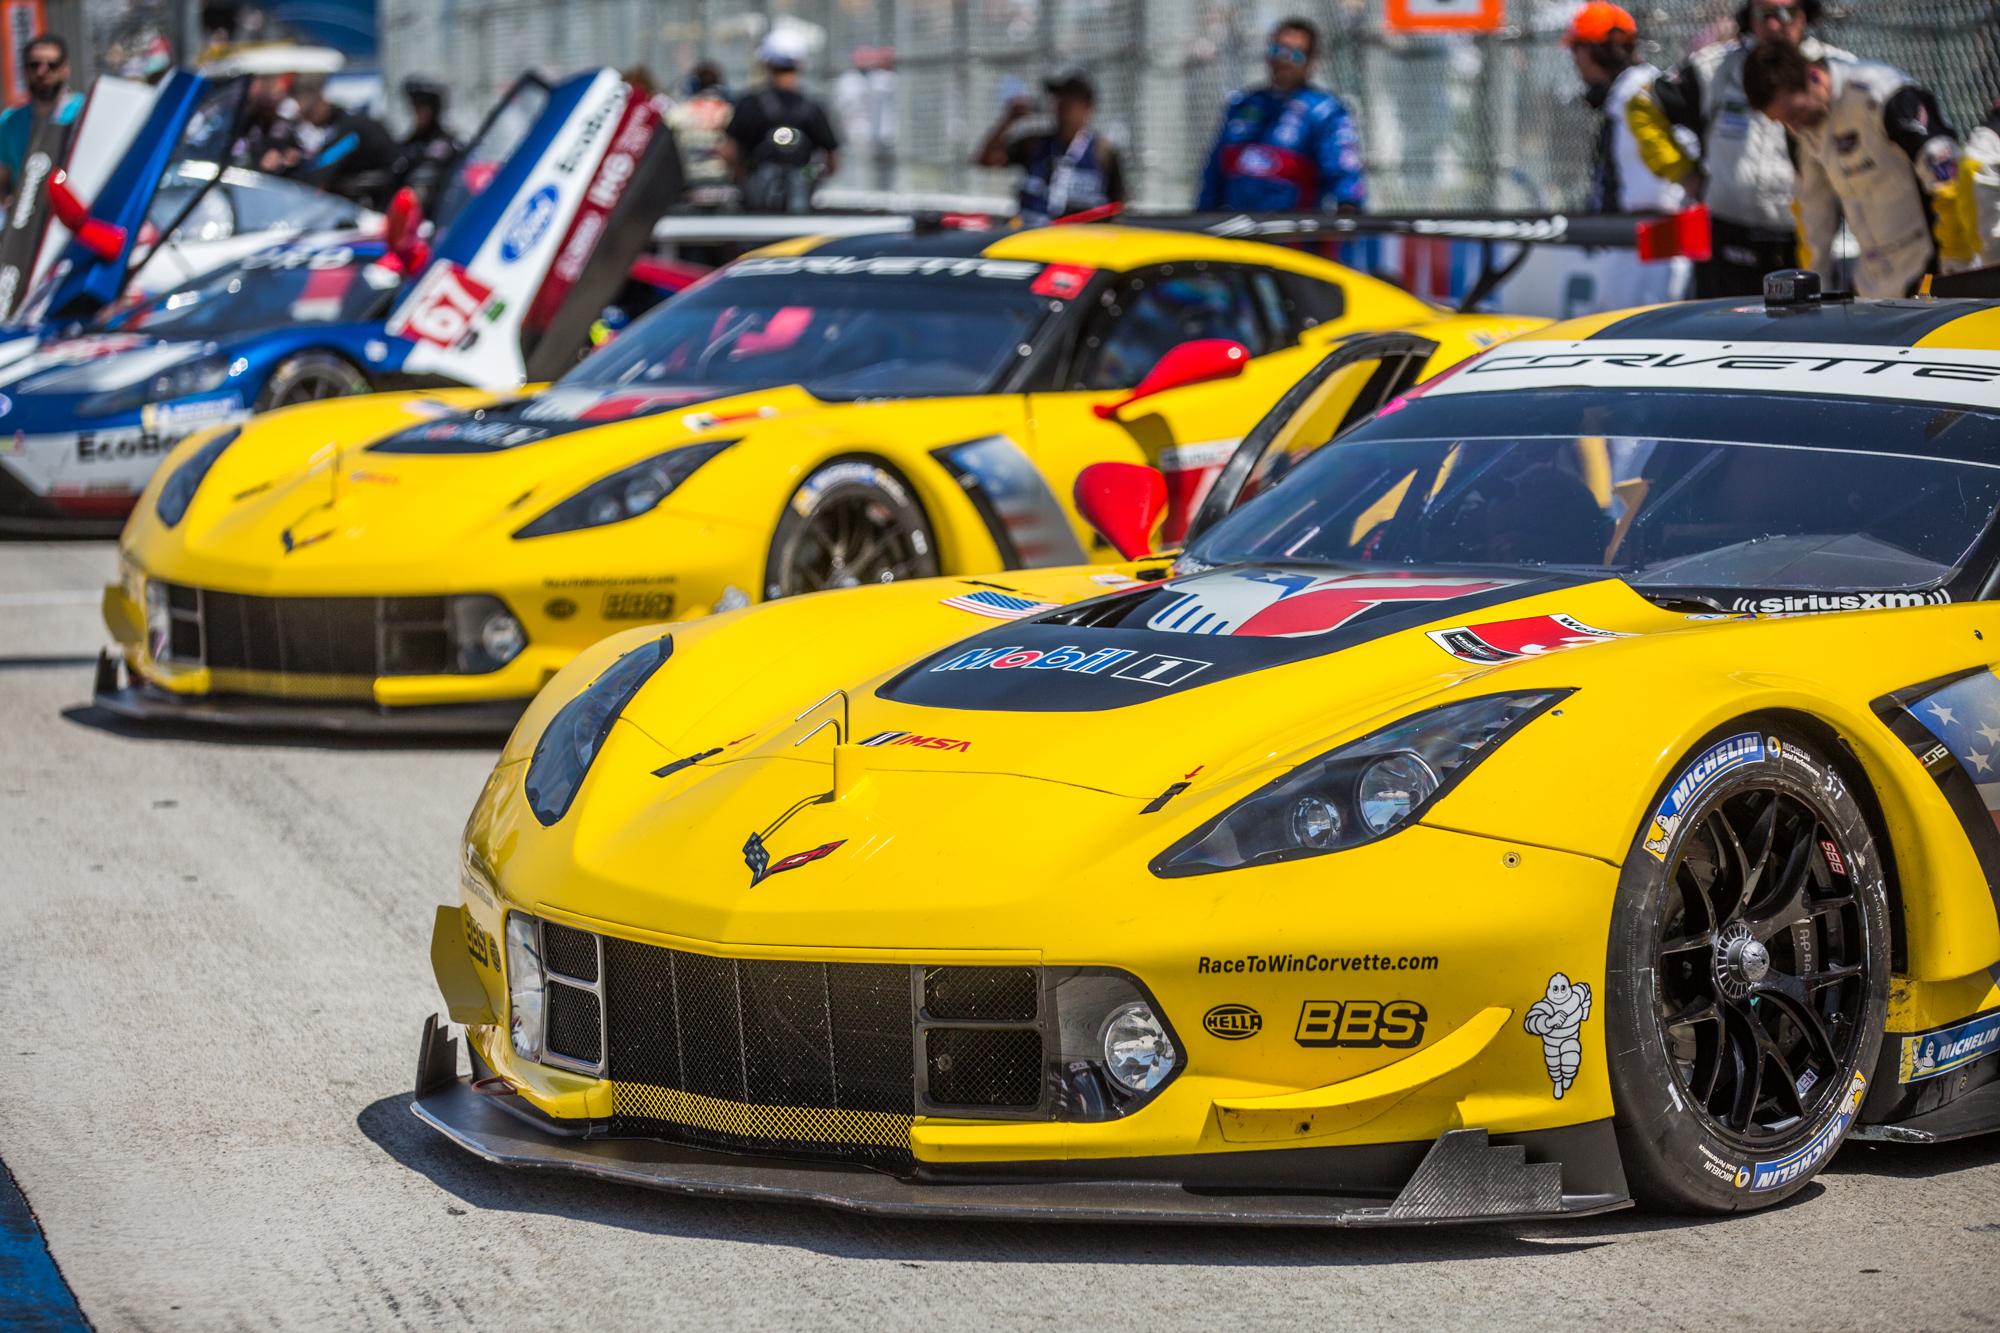 Corvetteforum.com Corvette Racing C7.R Long Beach Grand Prix 2018